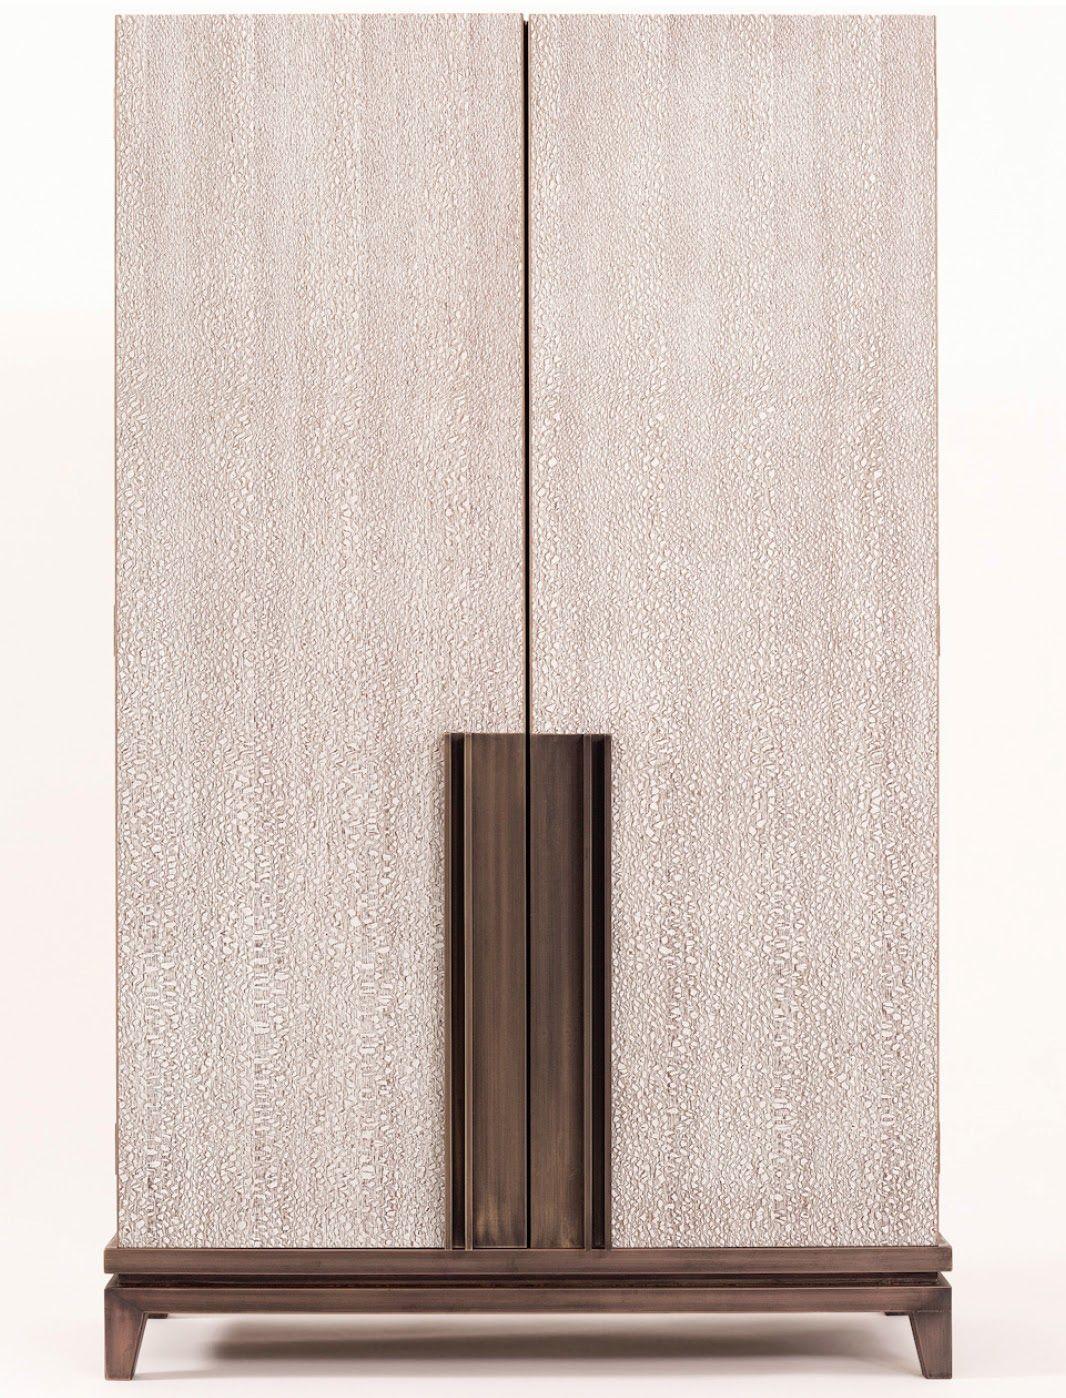 Studio annetta fbc furniture shelf u cabinet pinterest